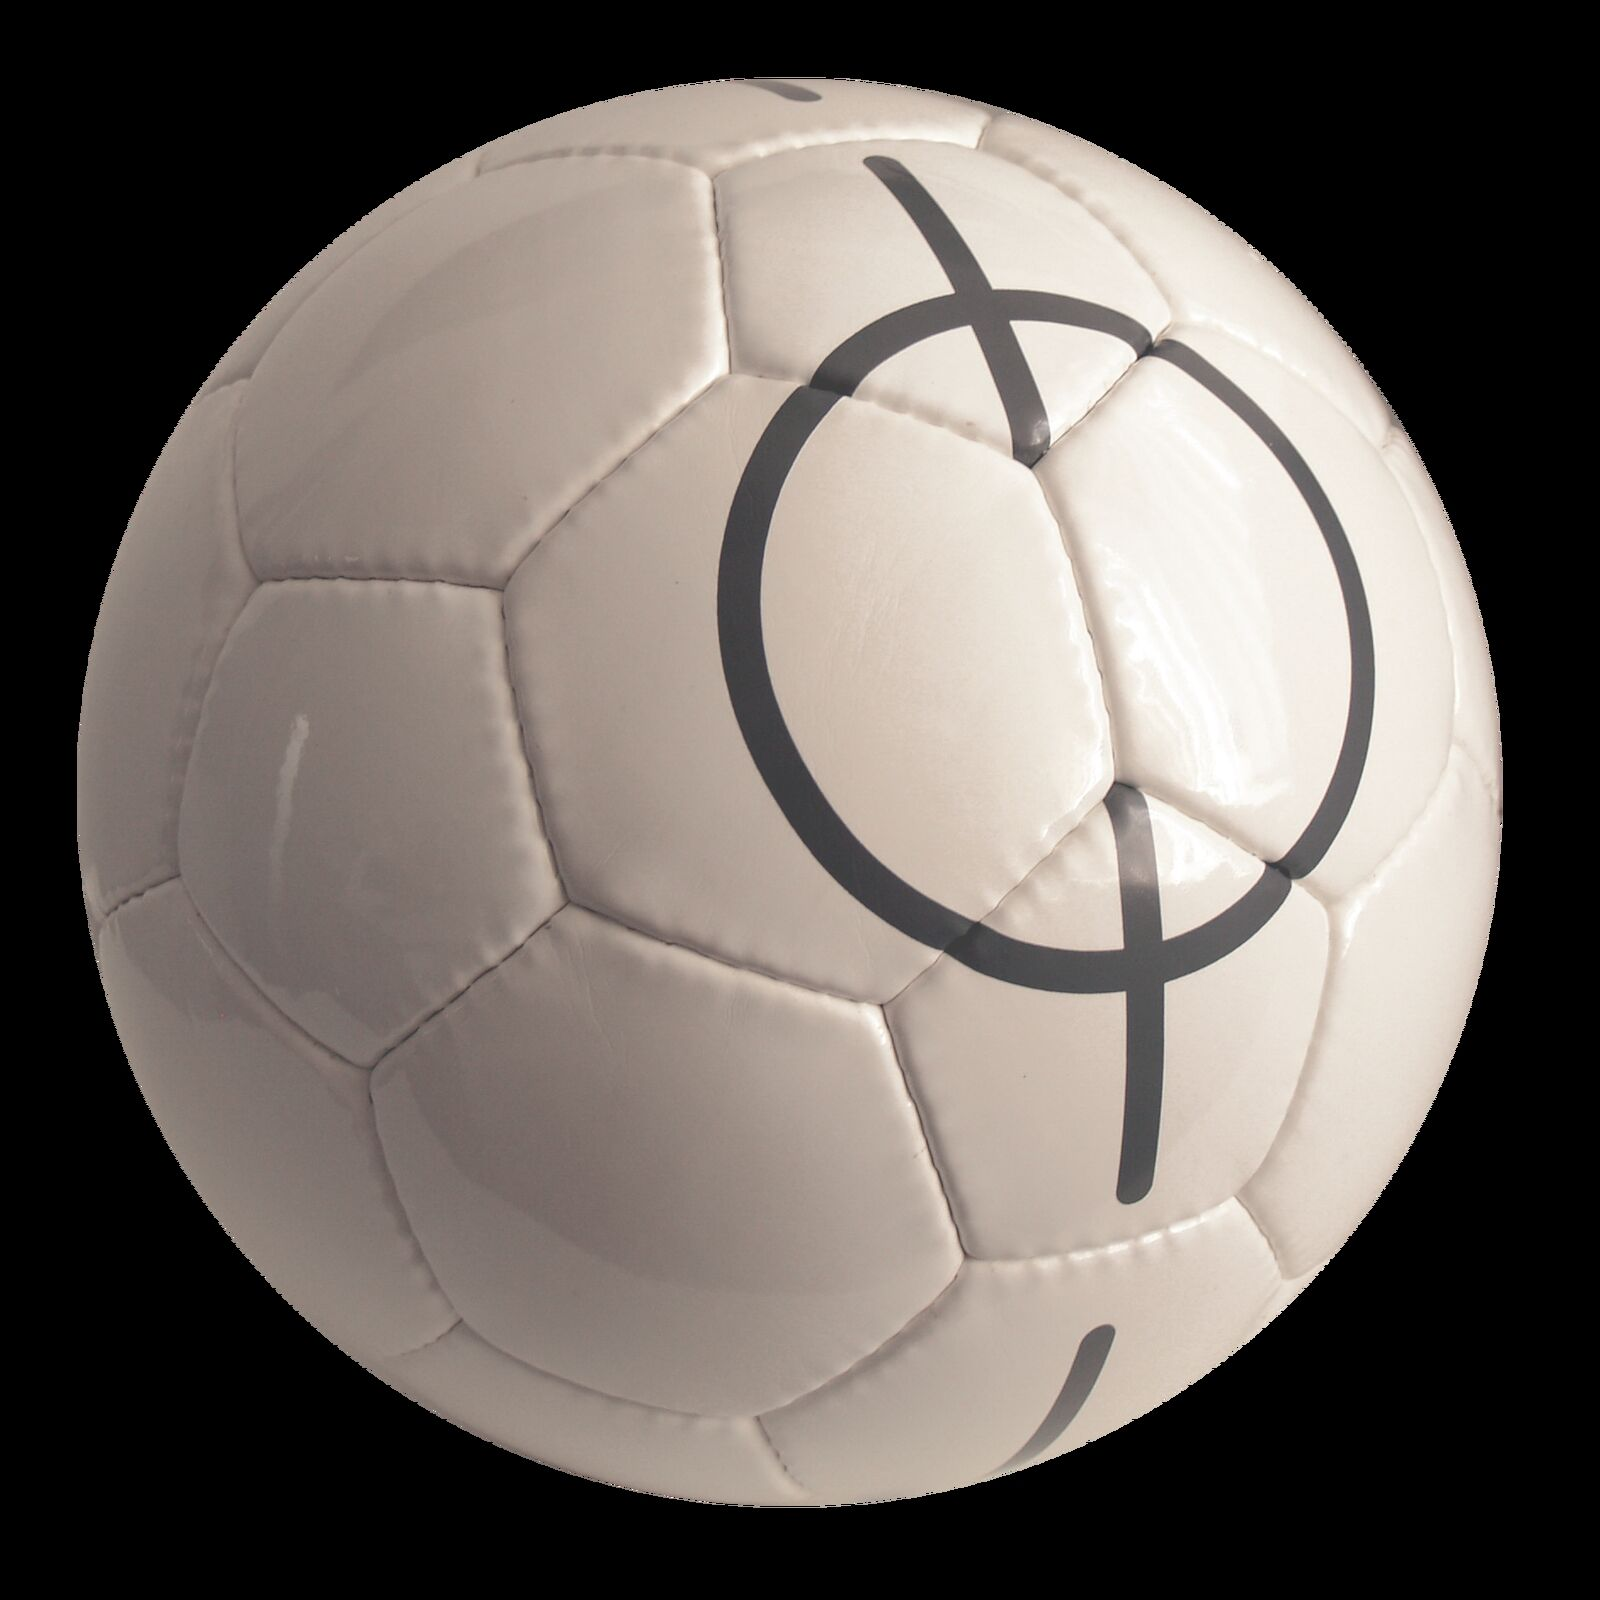 5x DERBYSTAR Fußball Blanko Gr. 5